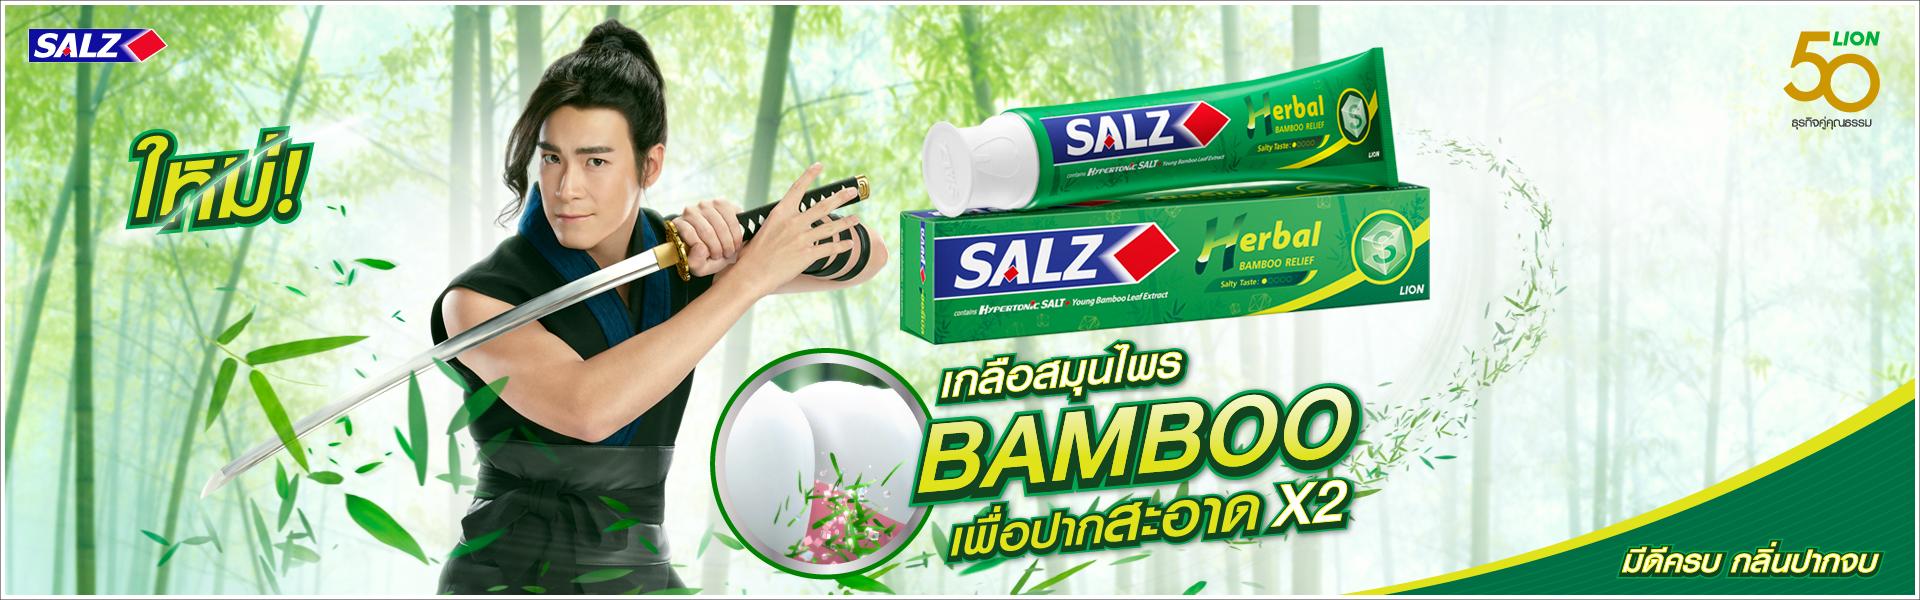 Salz Bamboo